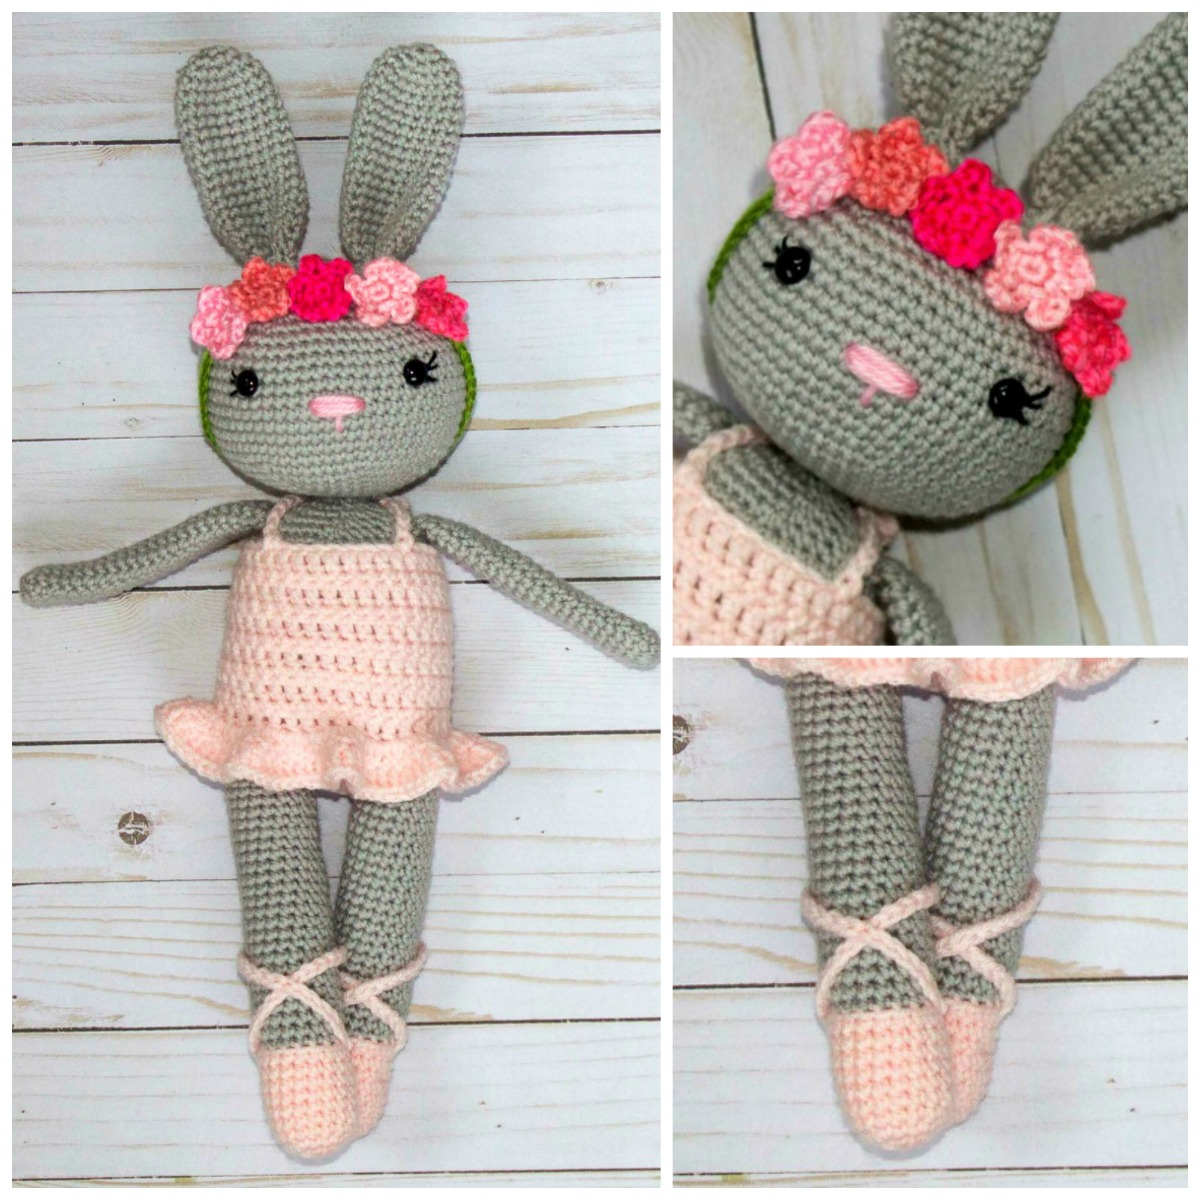 Ballerina Bunny Crochet Pattern Thefriendlyredfox